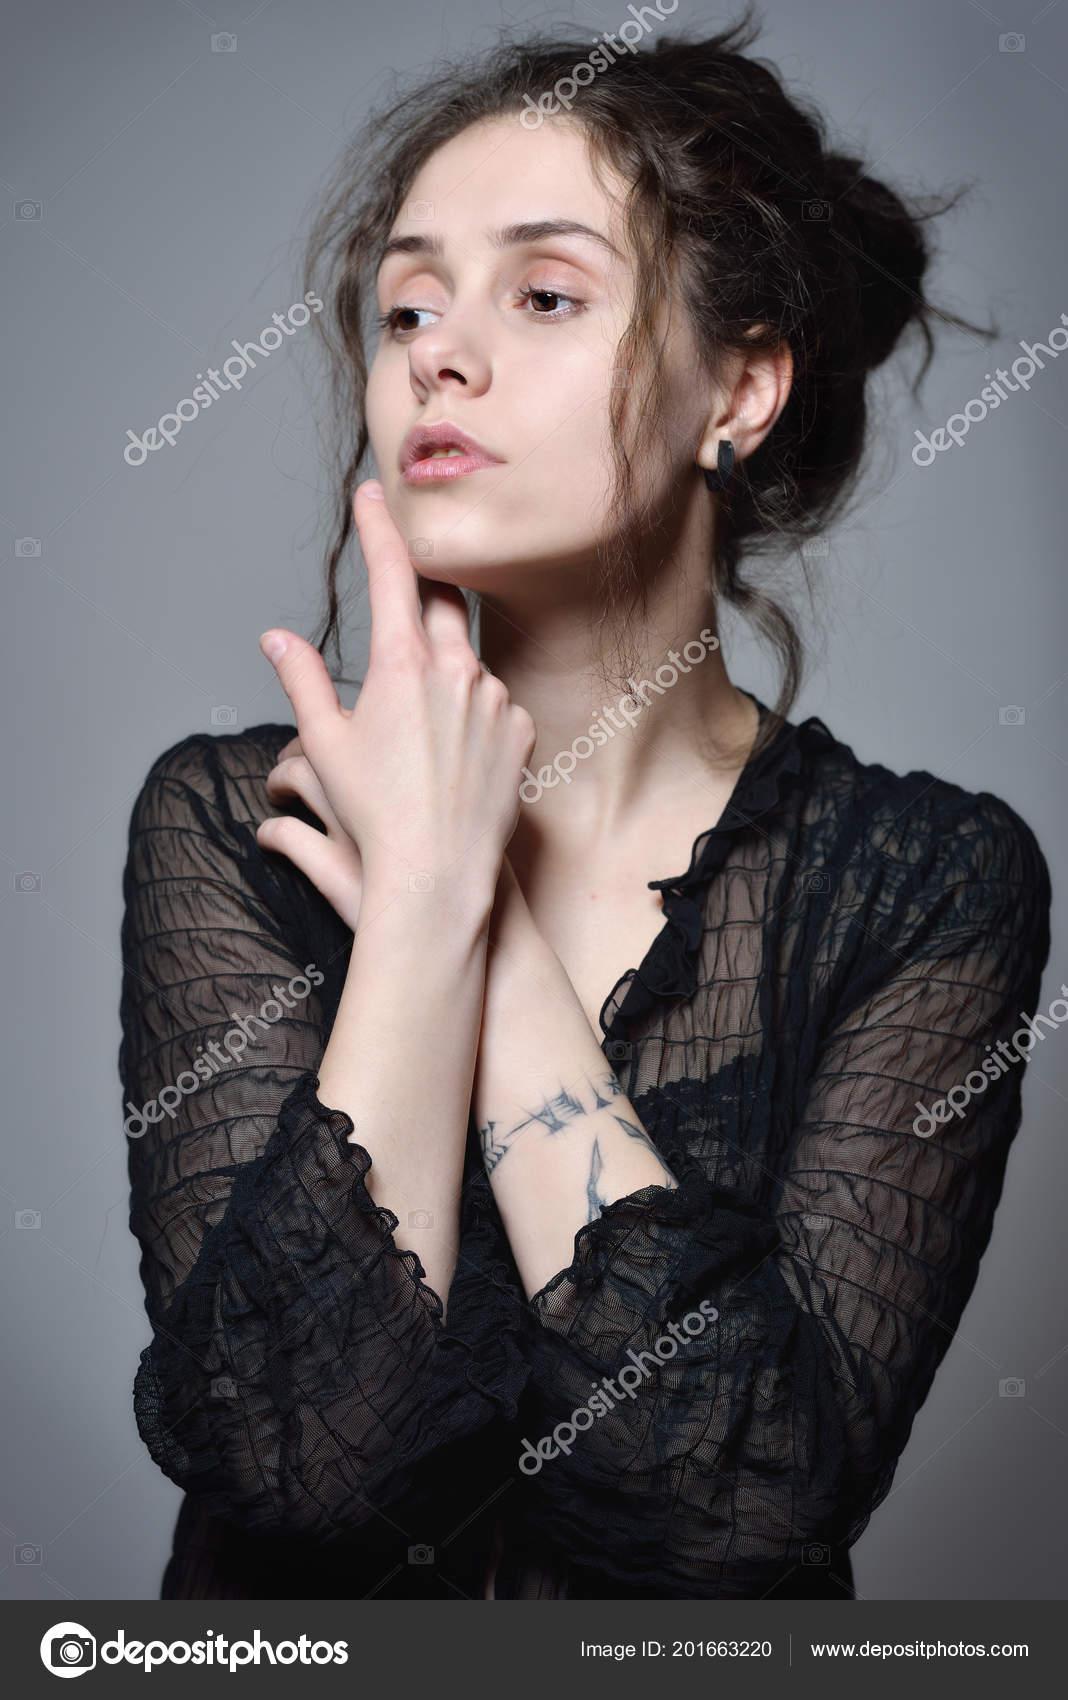 Transparente Hermosa Mujer Con Pelo Curva Negra Blusa Tatuaje 6gyYbf7